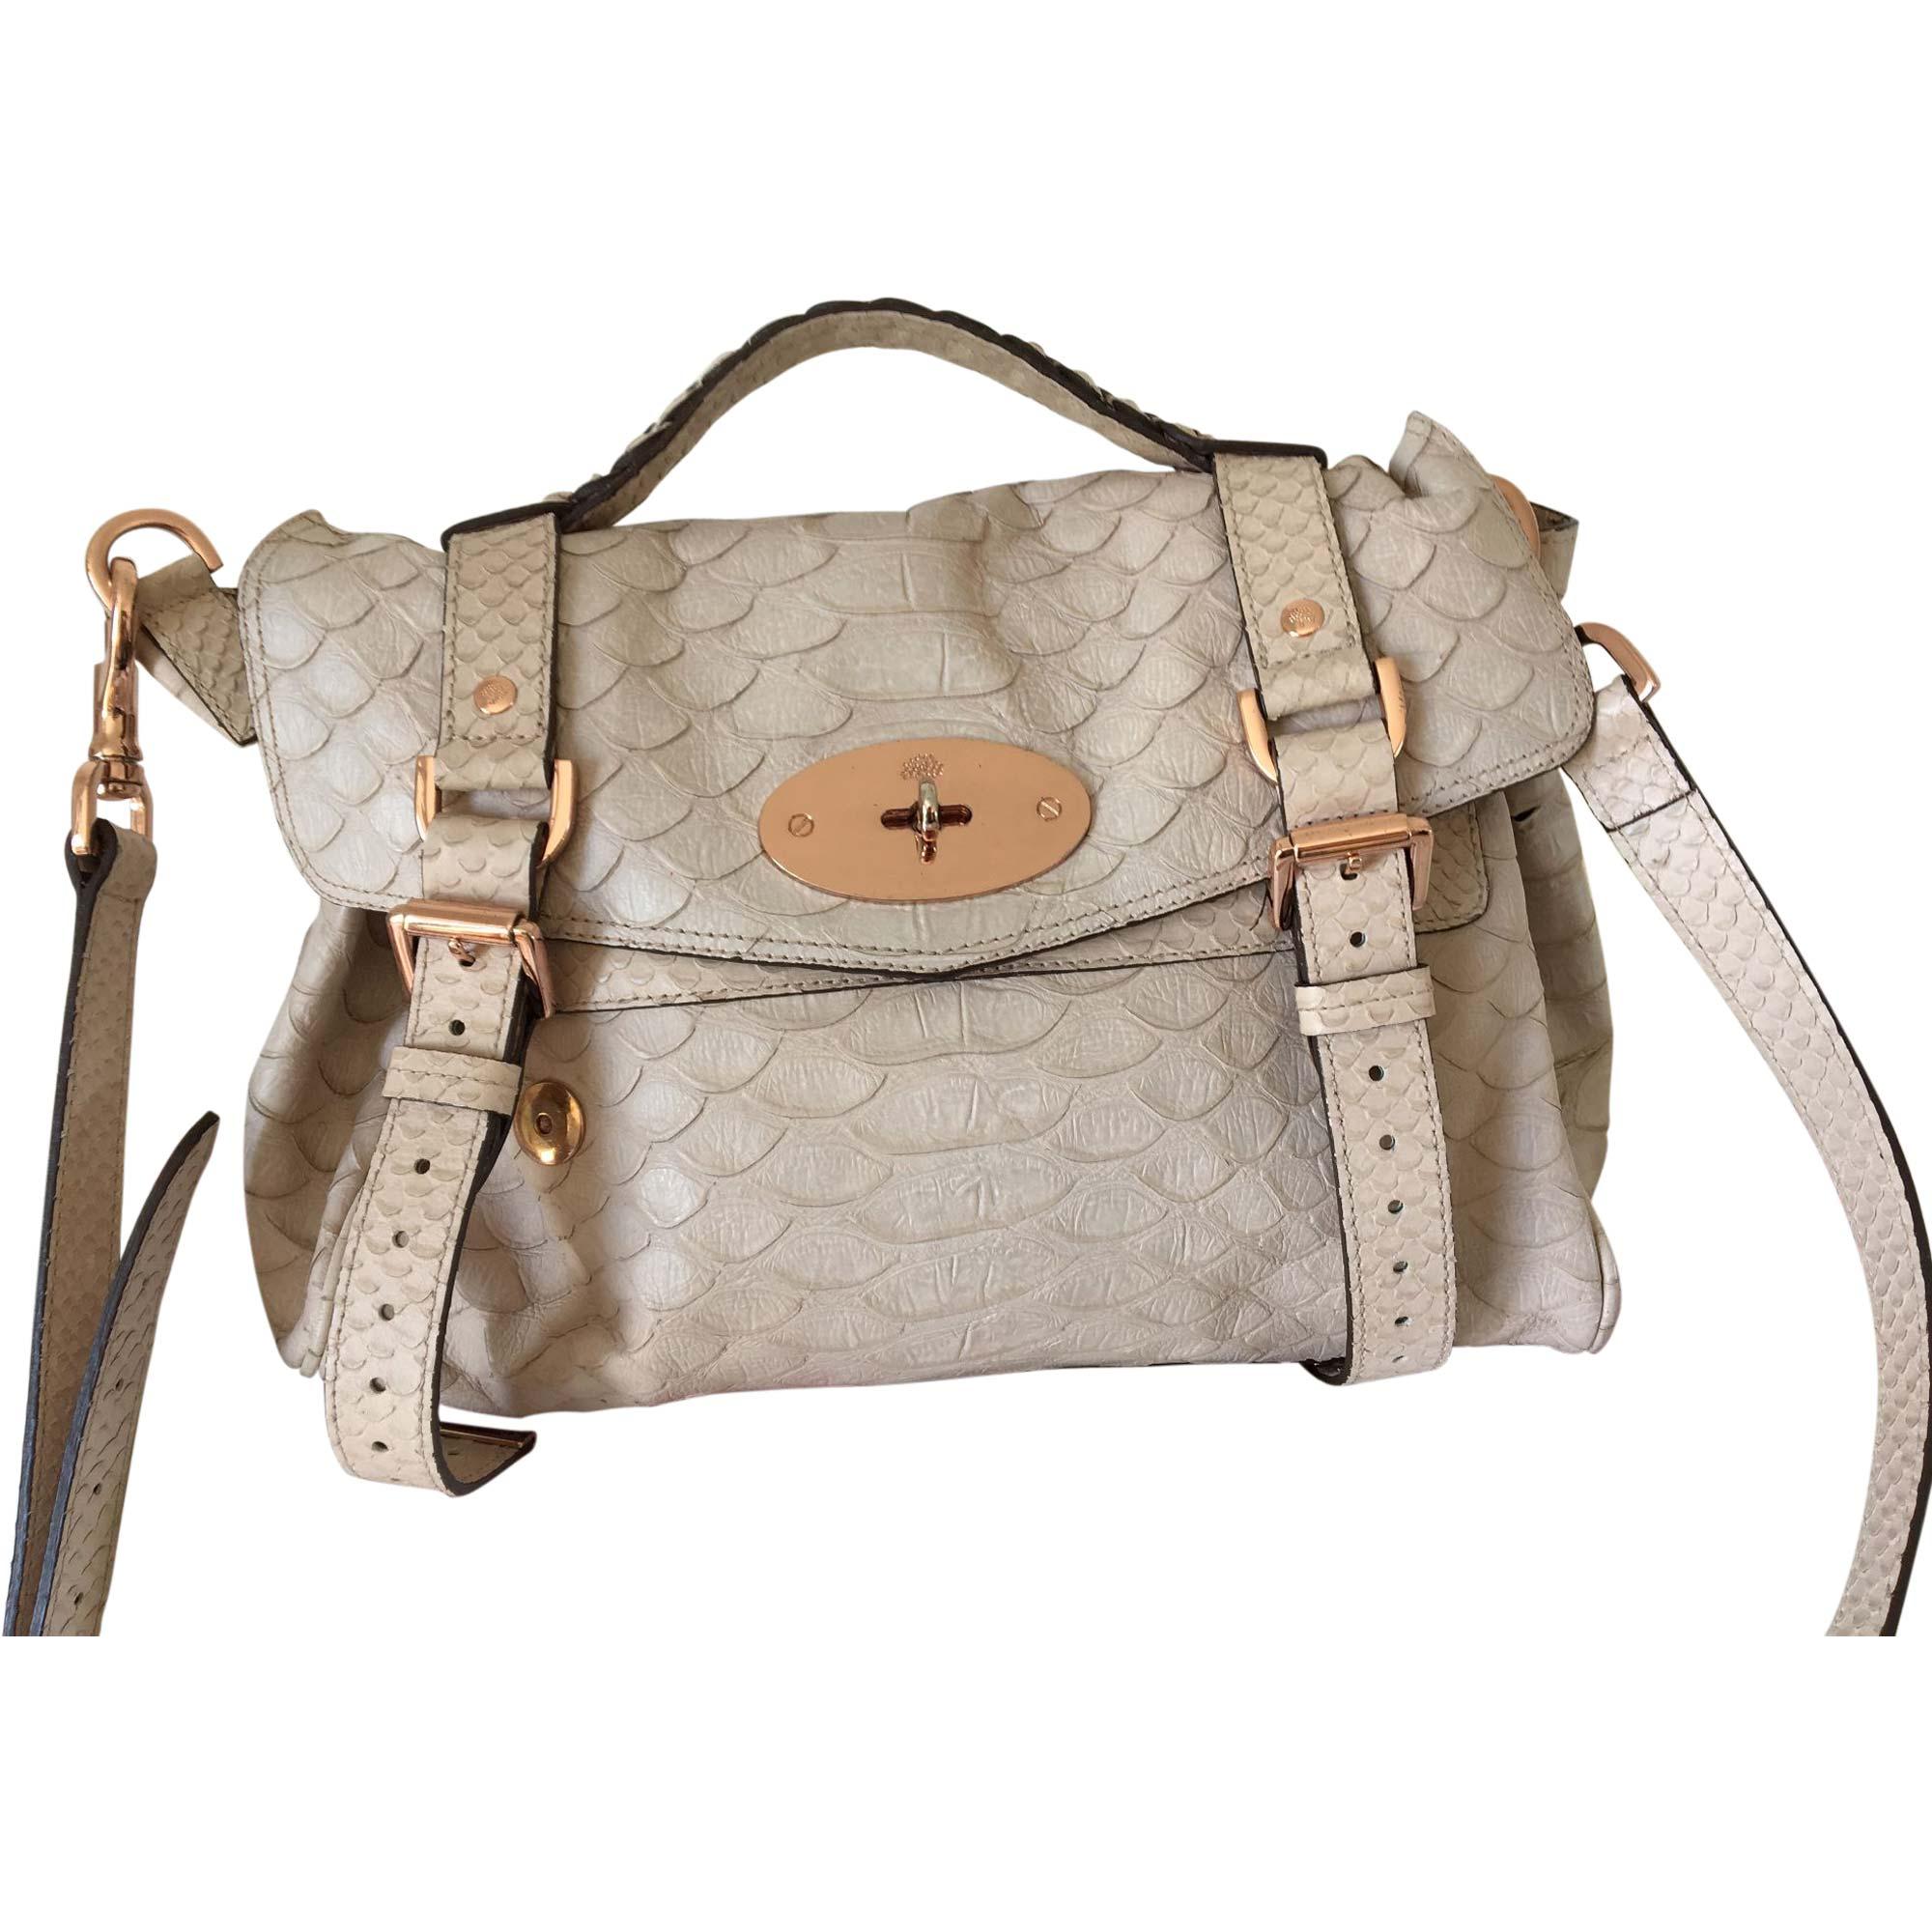 55bdf2ad74 Leather Handbag MULBERRY white - 7875876